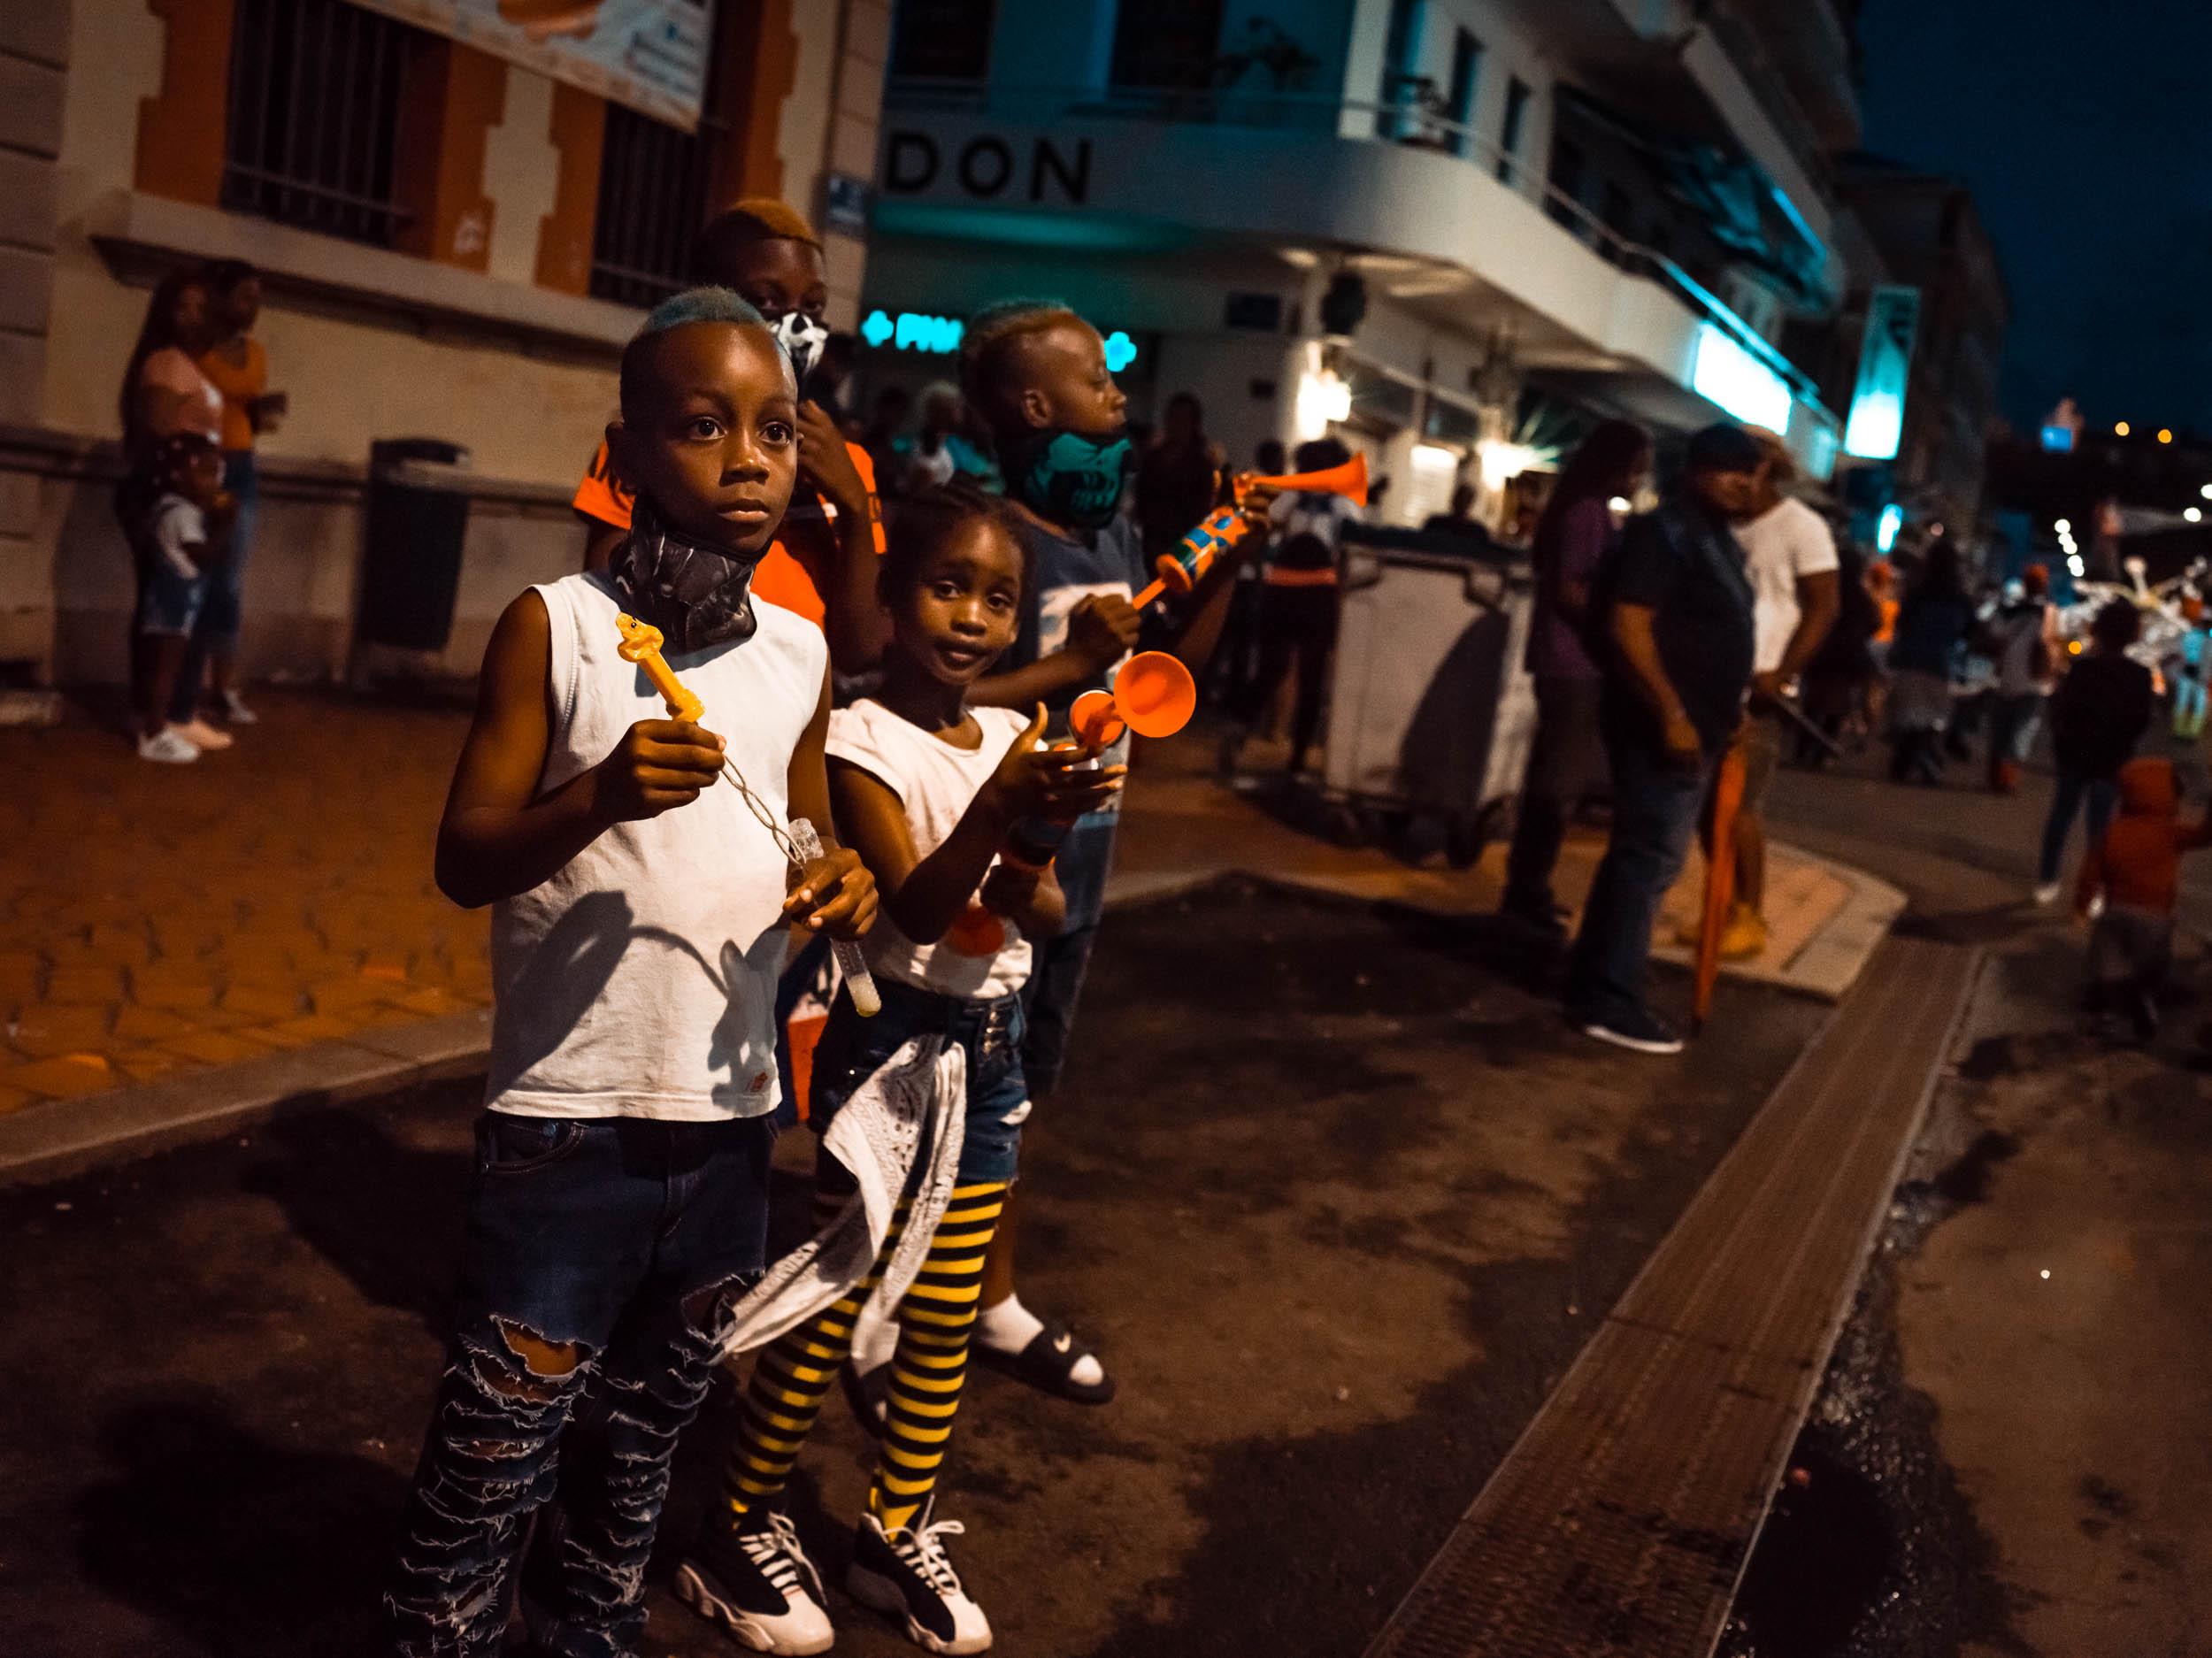 180212_SK_Martinique-80.jpg